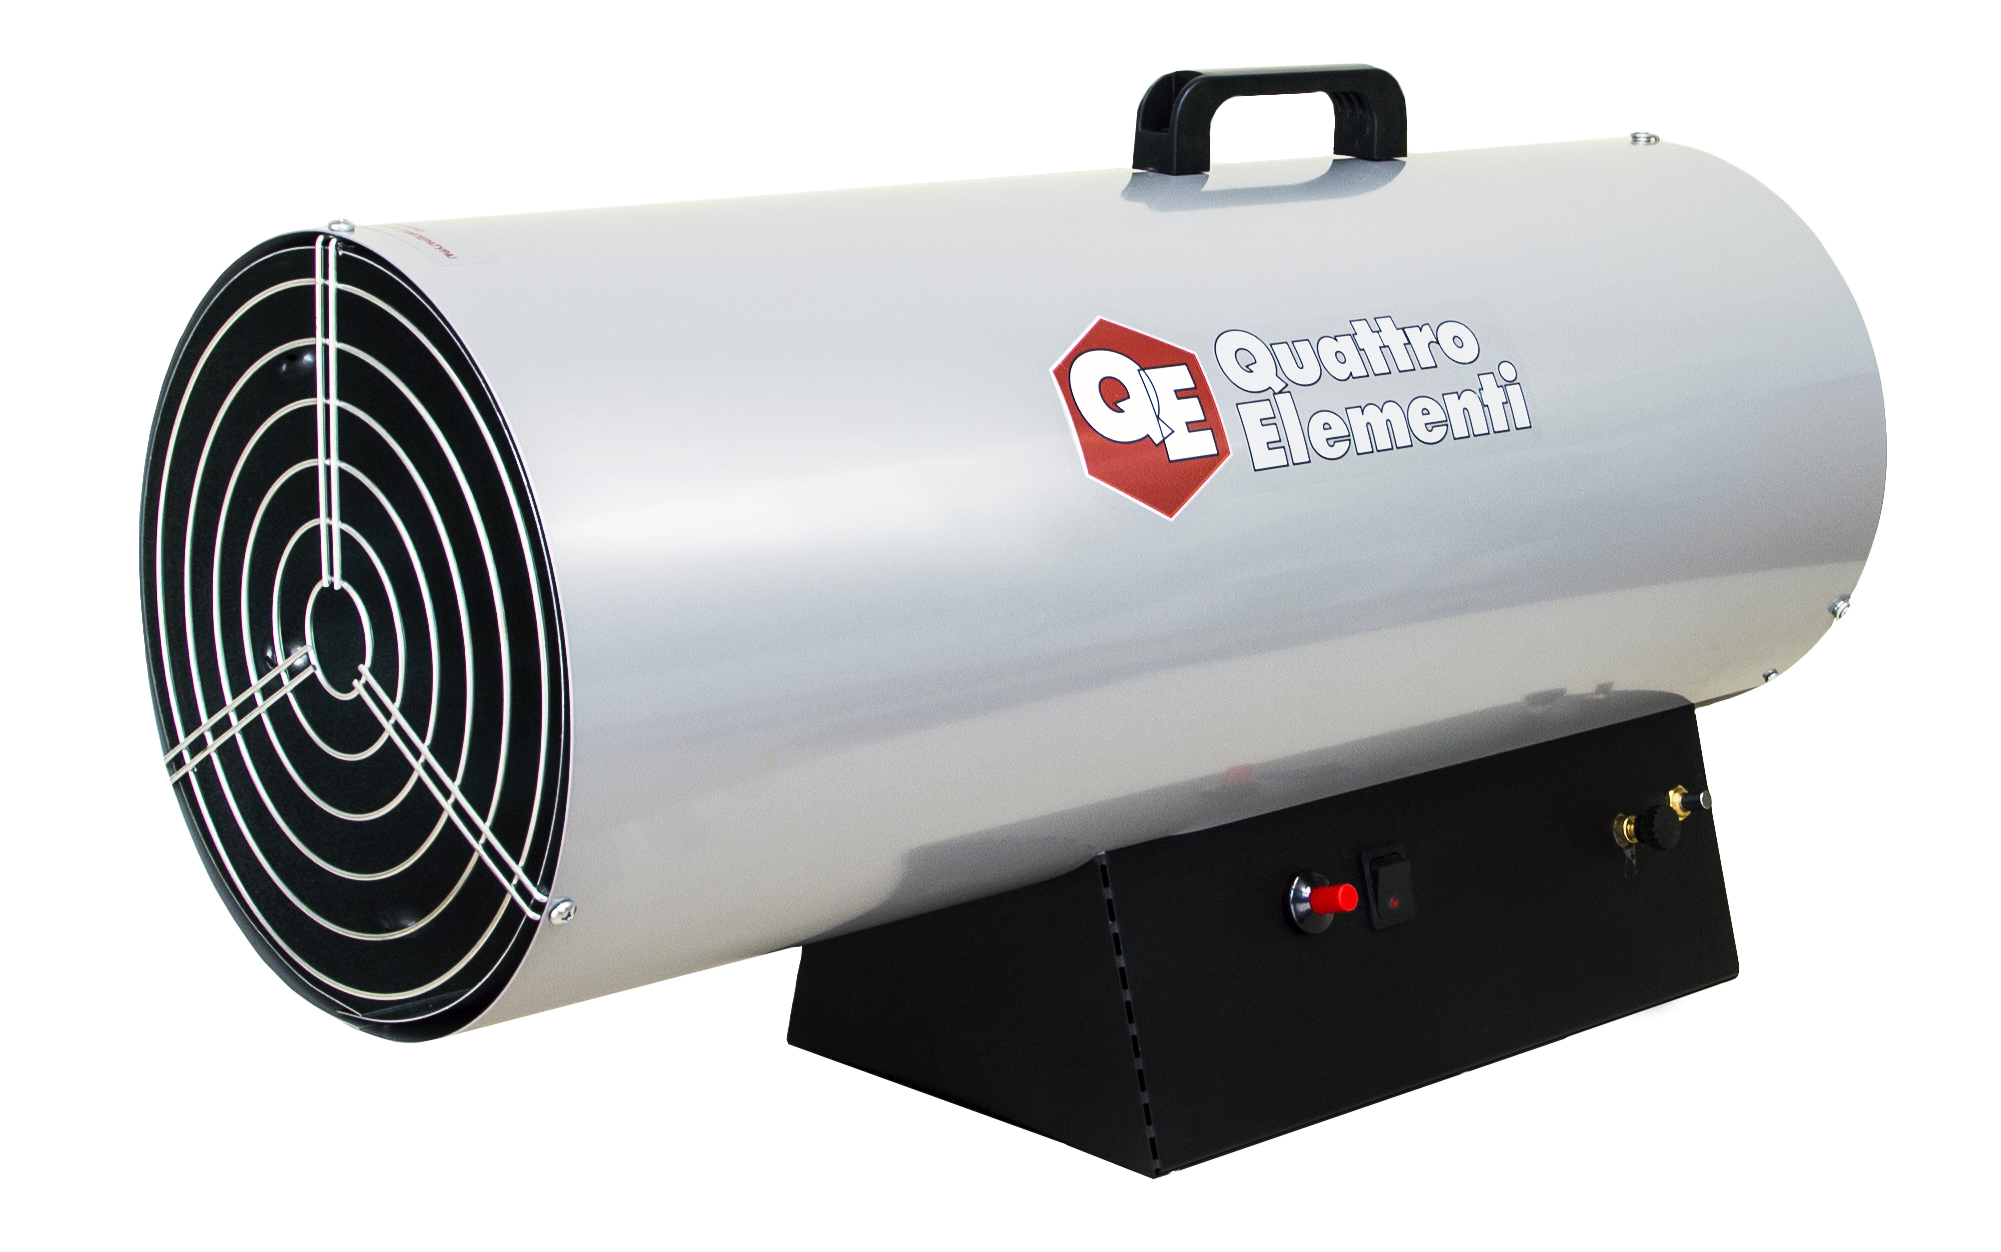 Тепловая пушка Quattro elementi Qe-35g 243-950 cook100 140 3 35g